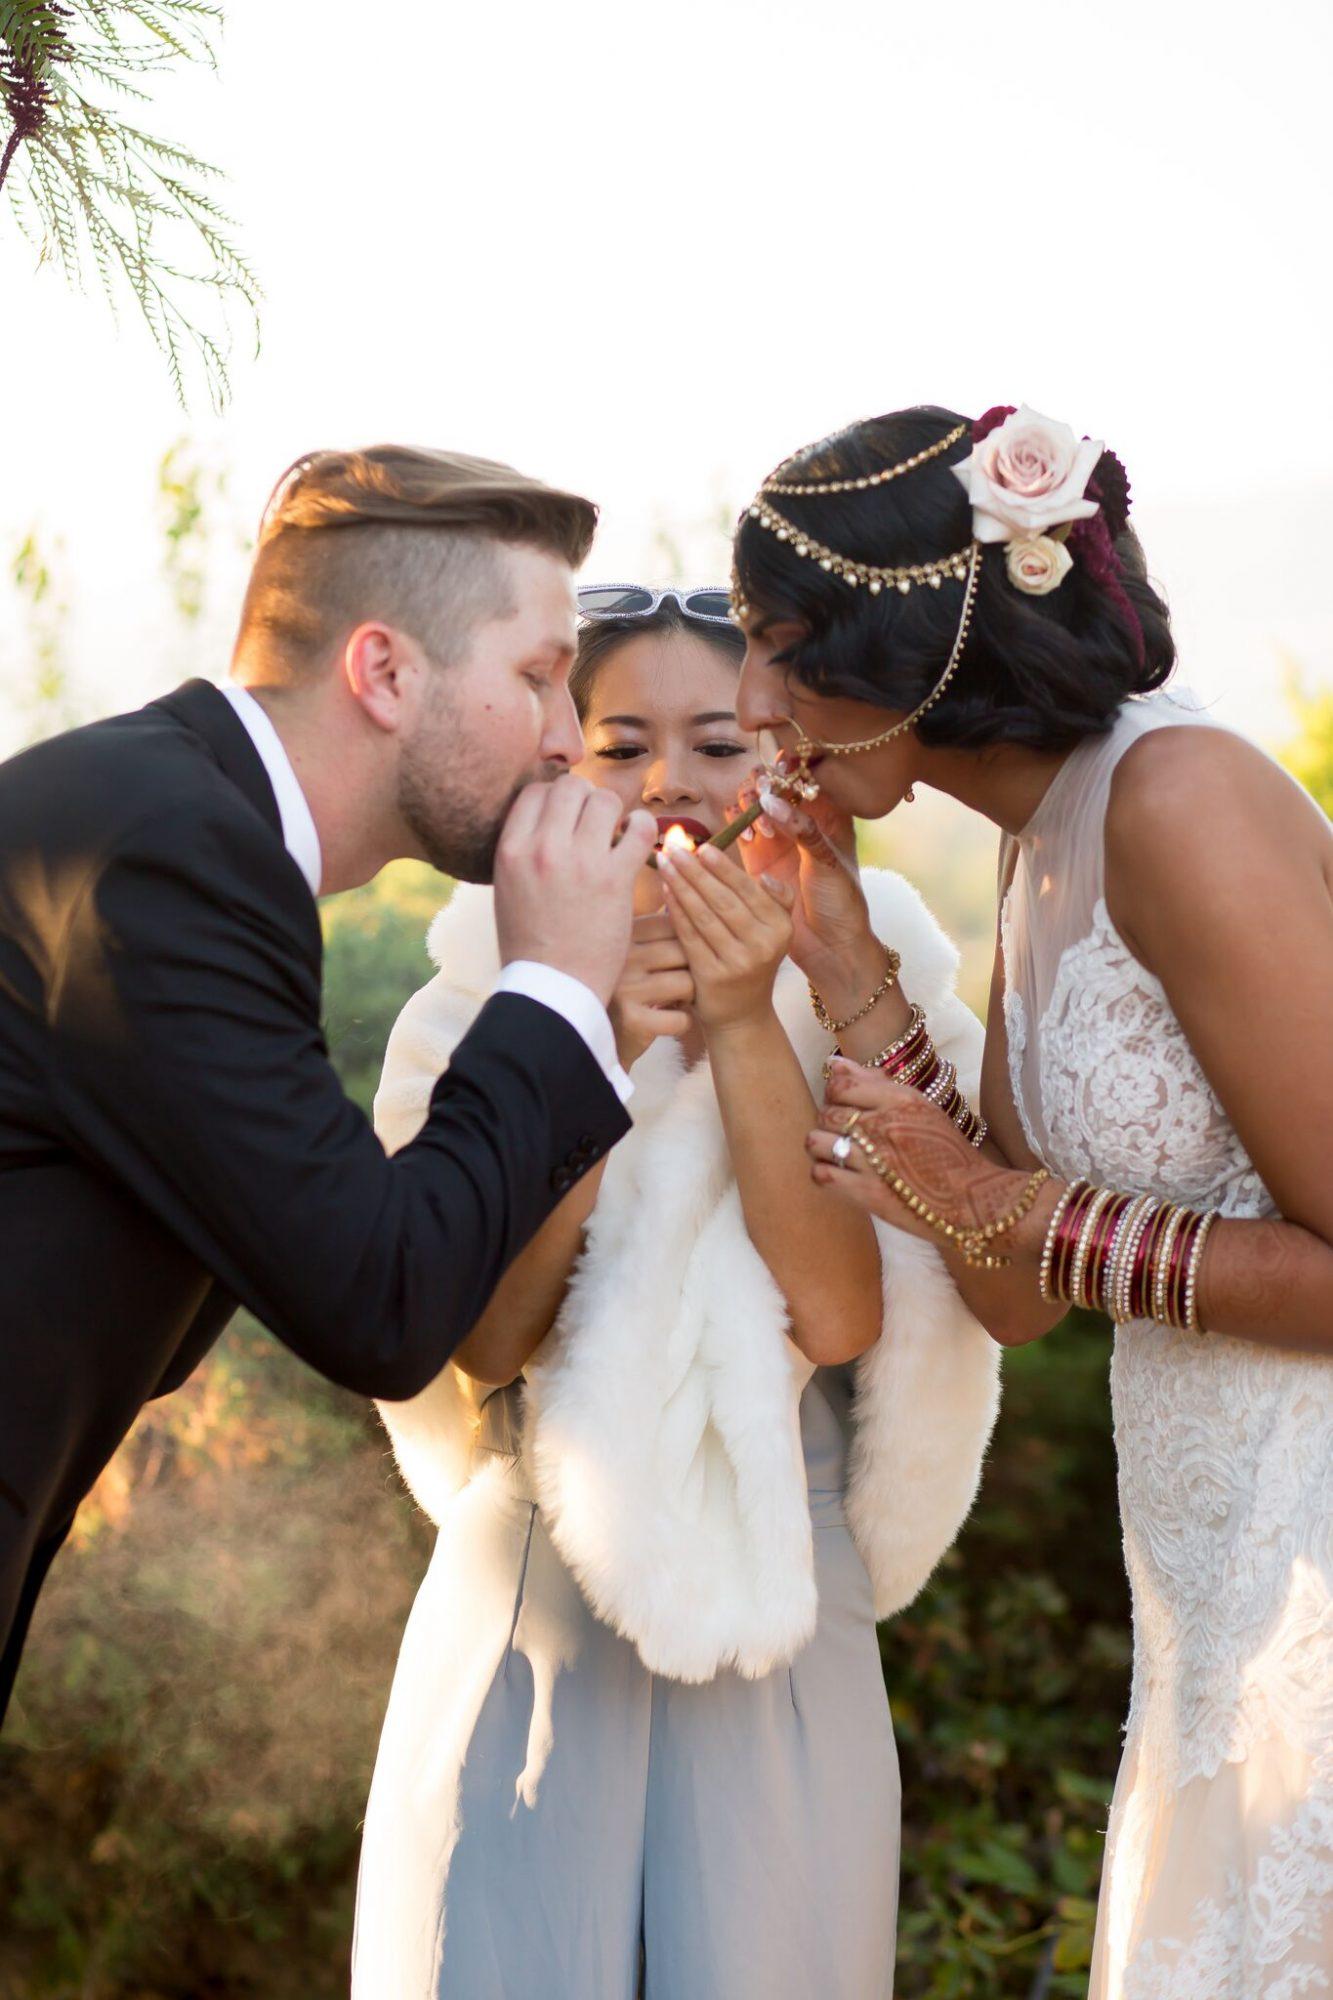 vows-wedding.jpeg